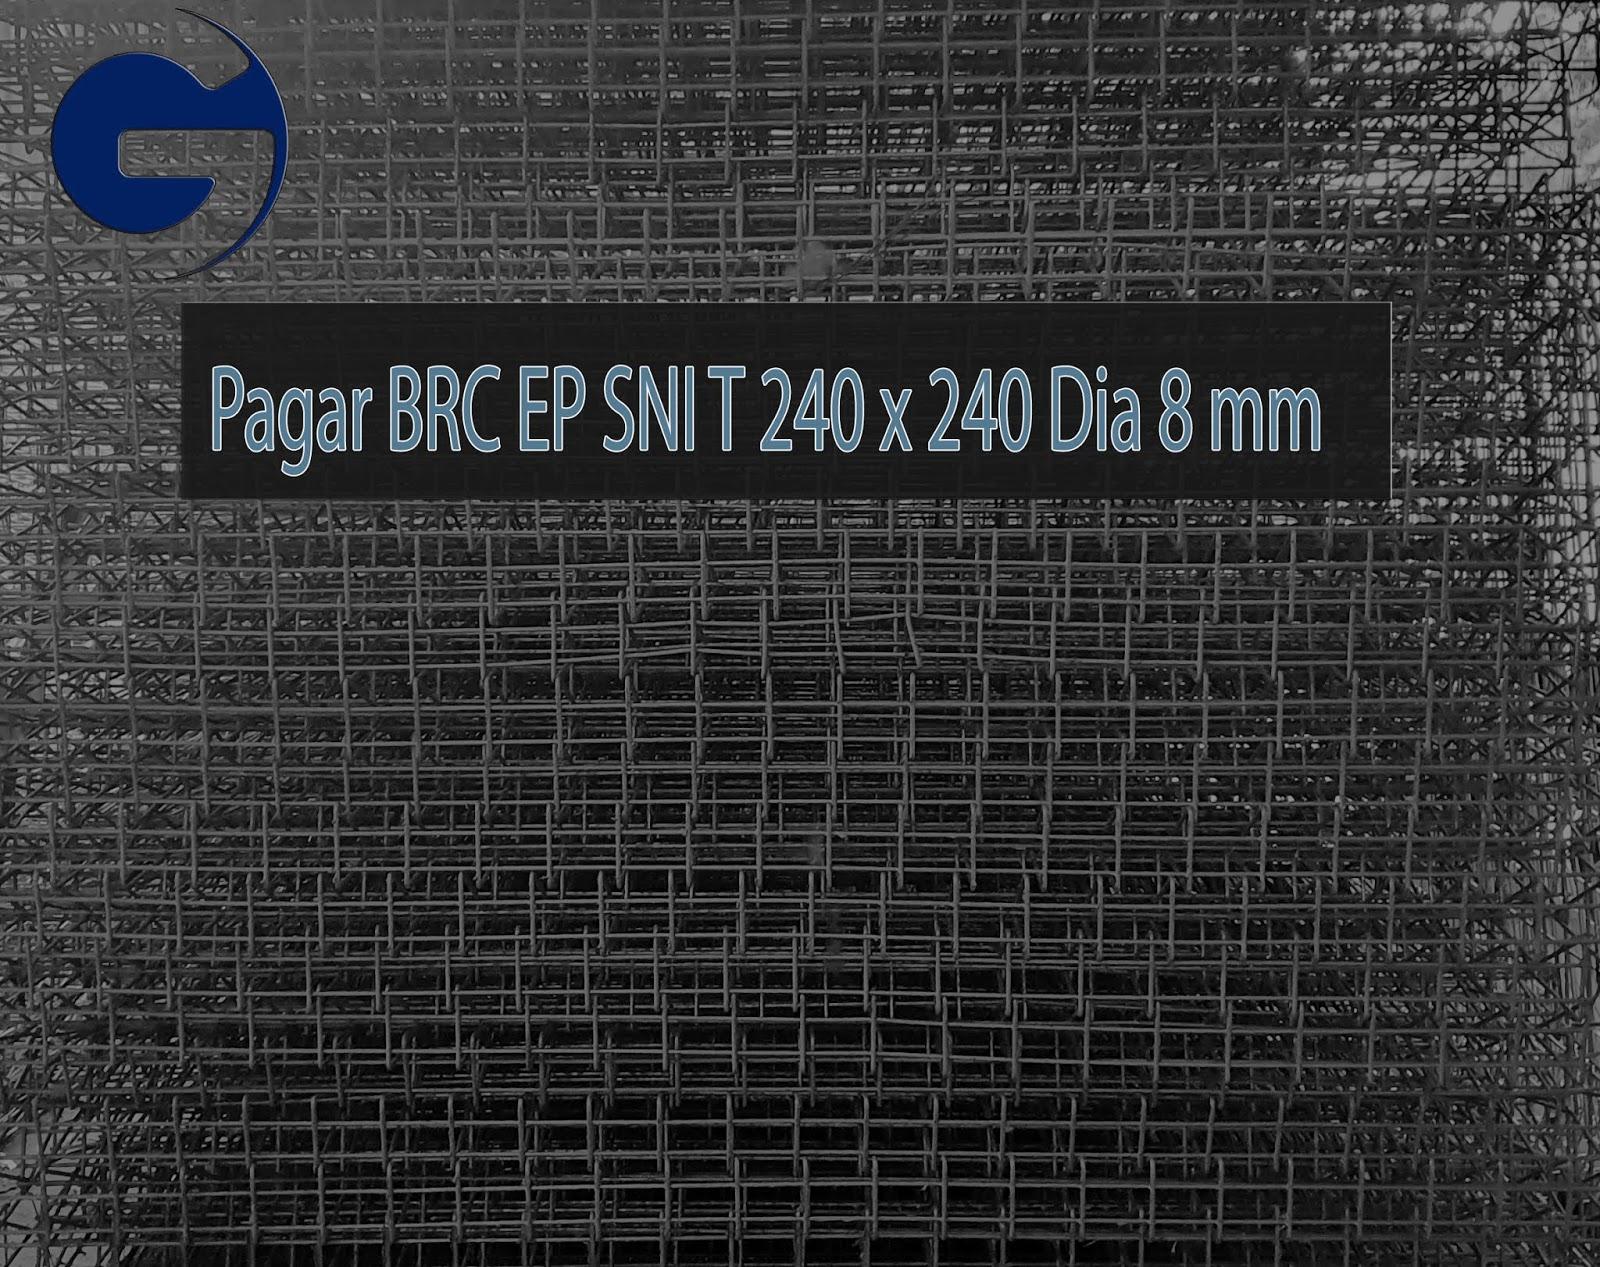 Jual Pagar BRC EP SNI T 240 x 240 Dia 8 mm